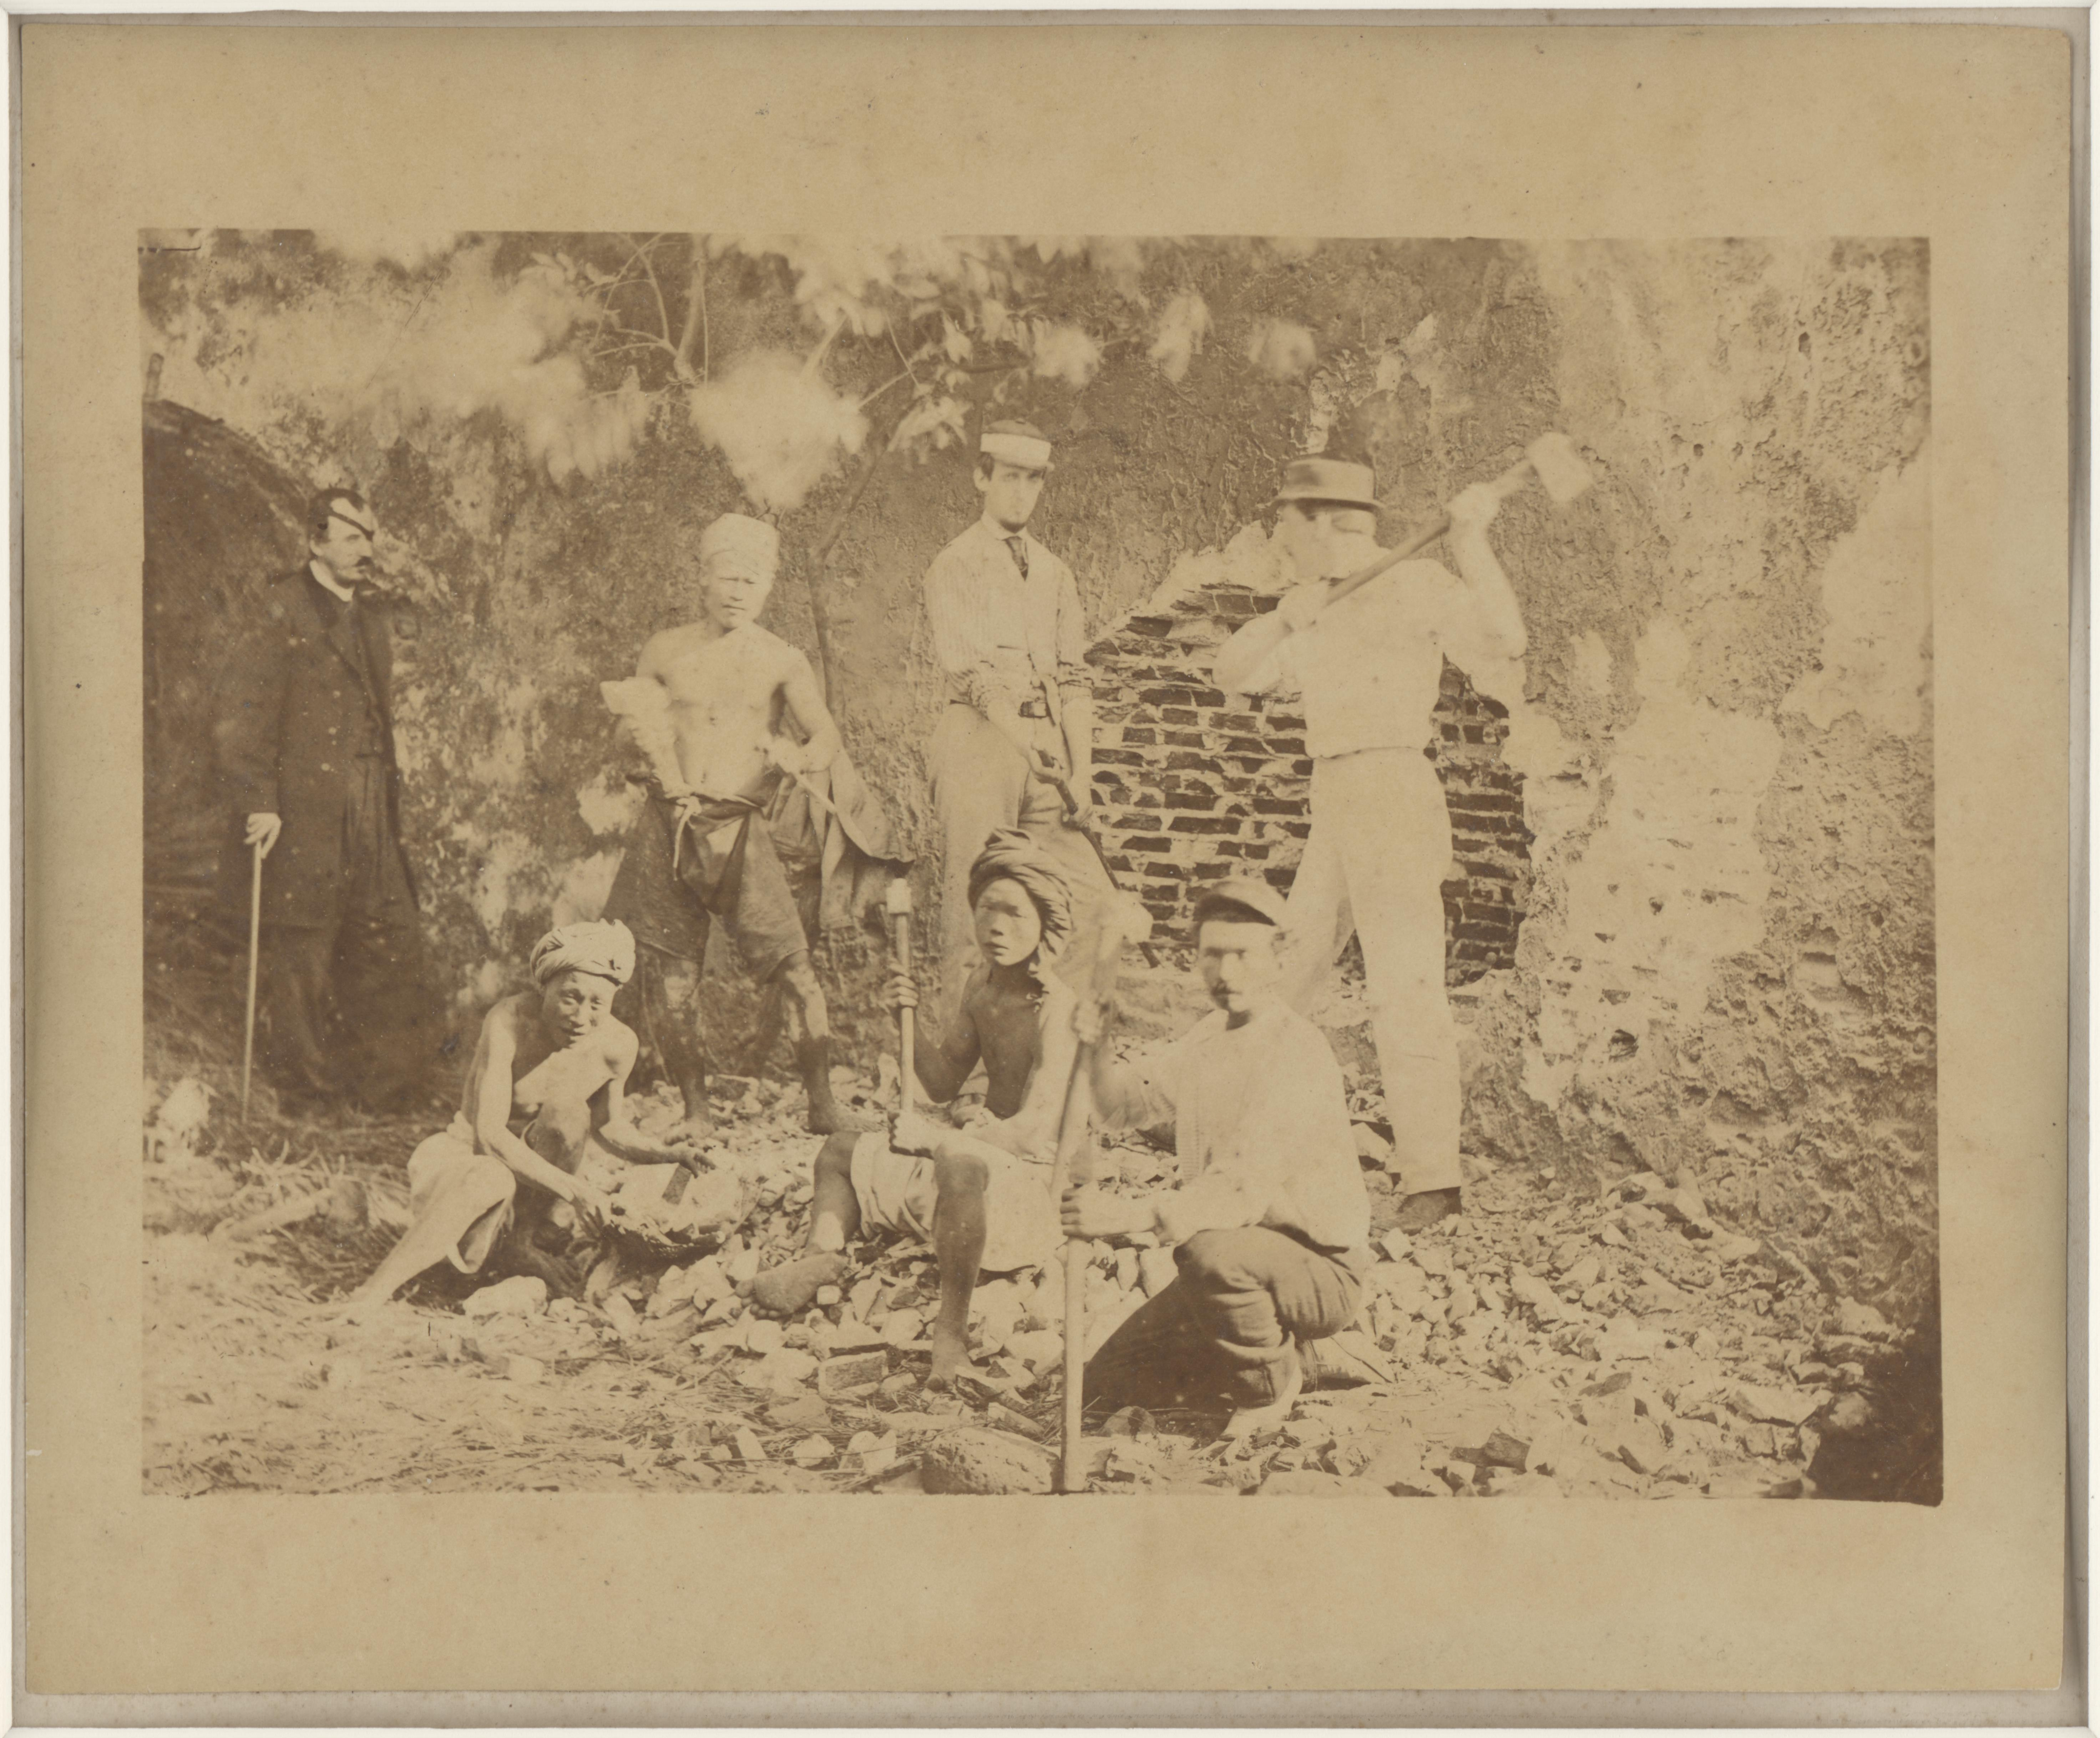 St. Julian Hugh Edwards是最早旅台的拍攝者(圖/〈挖掘熱蘭遮城〉/國家攝影文化中心)